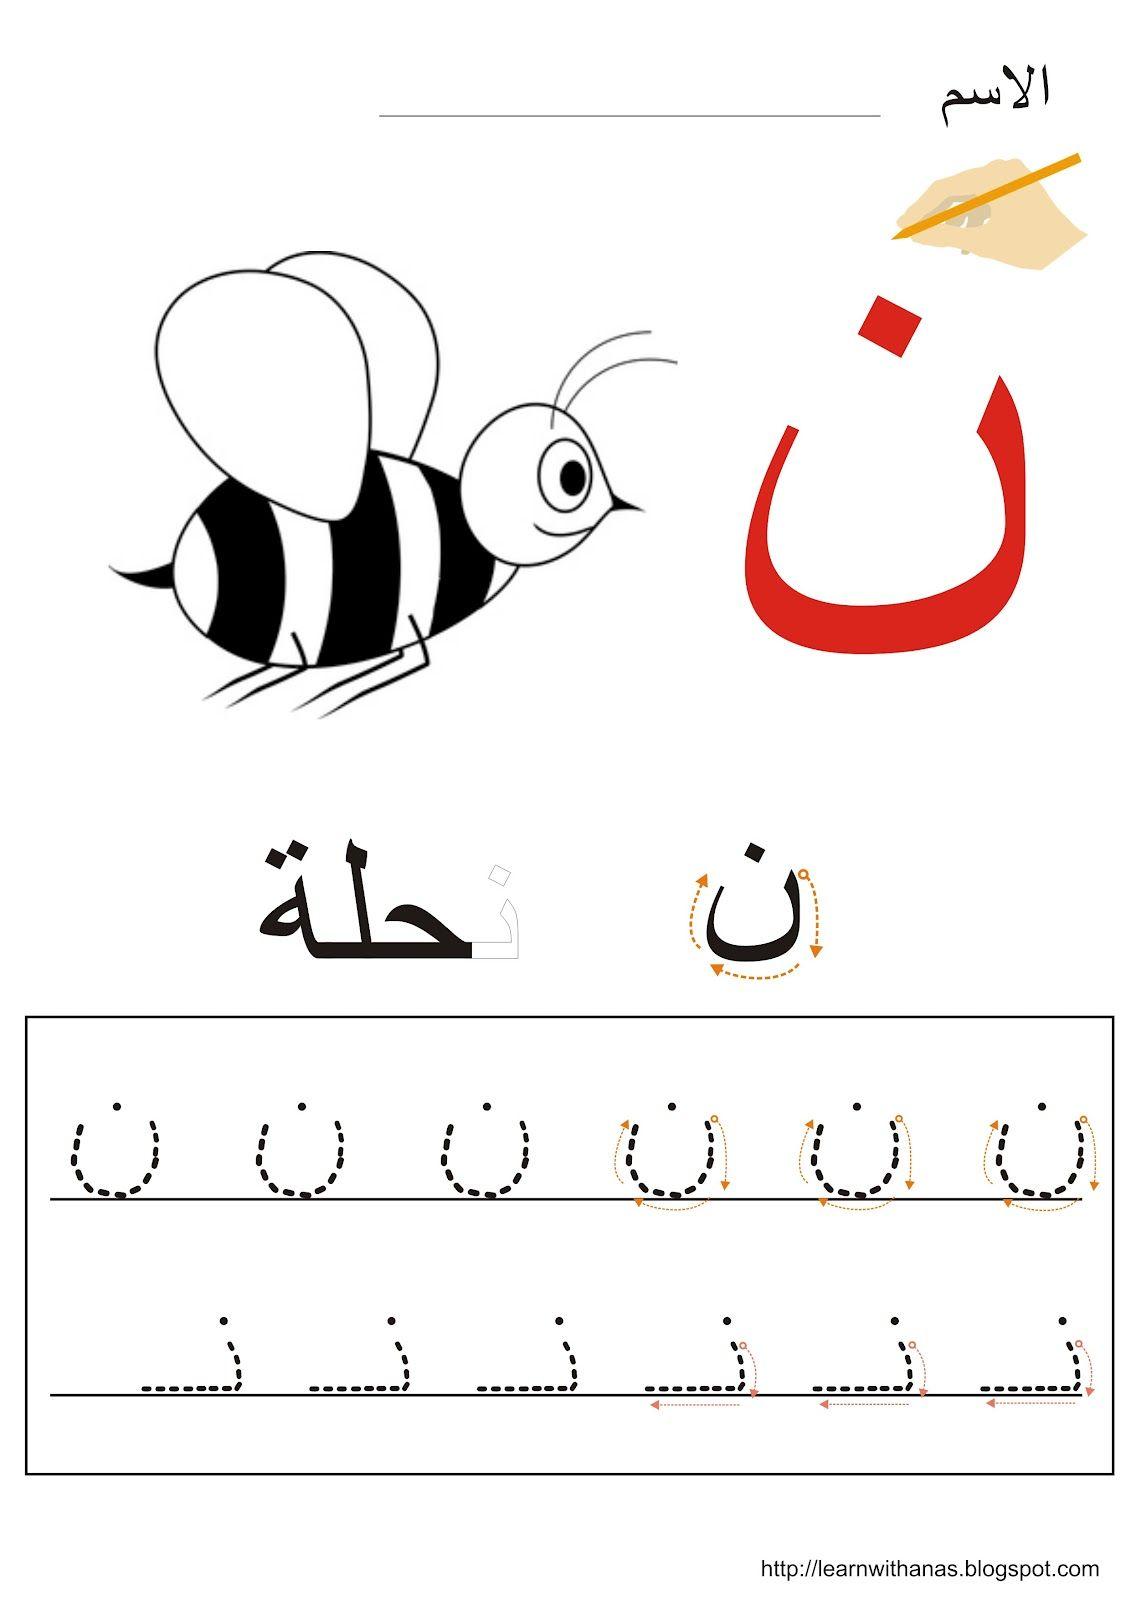 تعلم مع أنس Alphabet Letter Crafts Learn Arabic Alphabet Arabic Alphabet For Kids